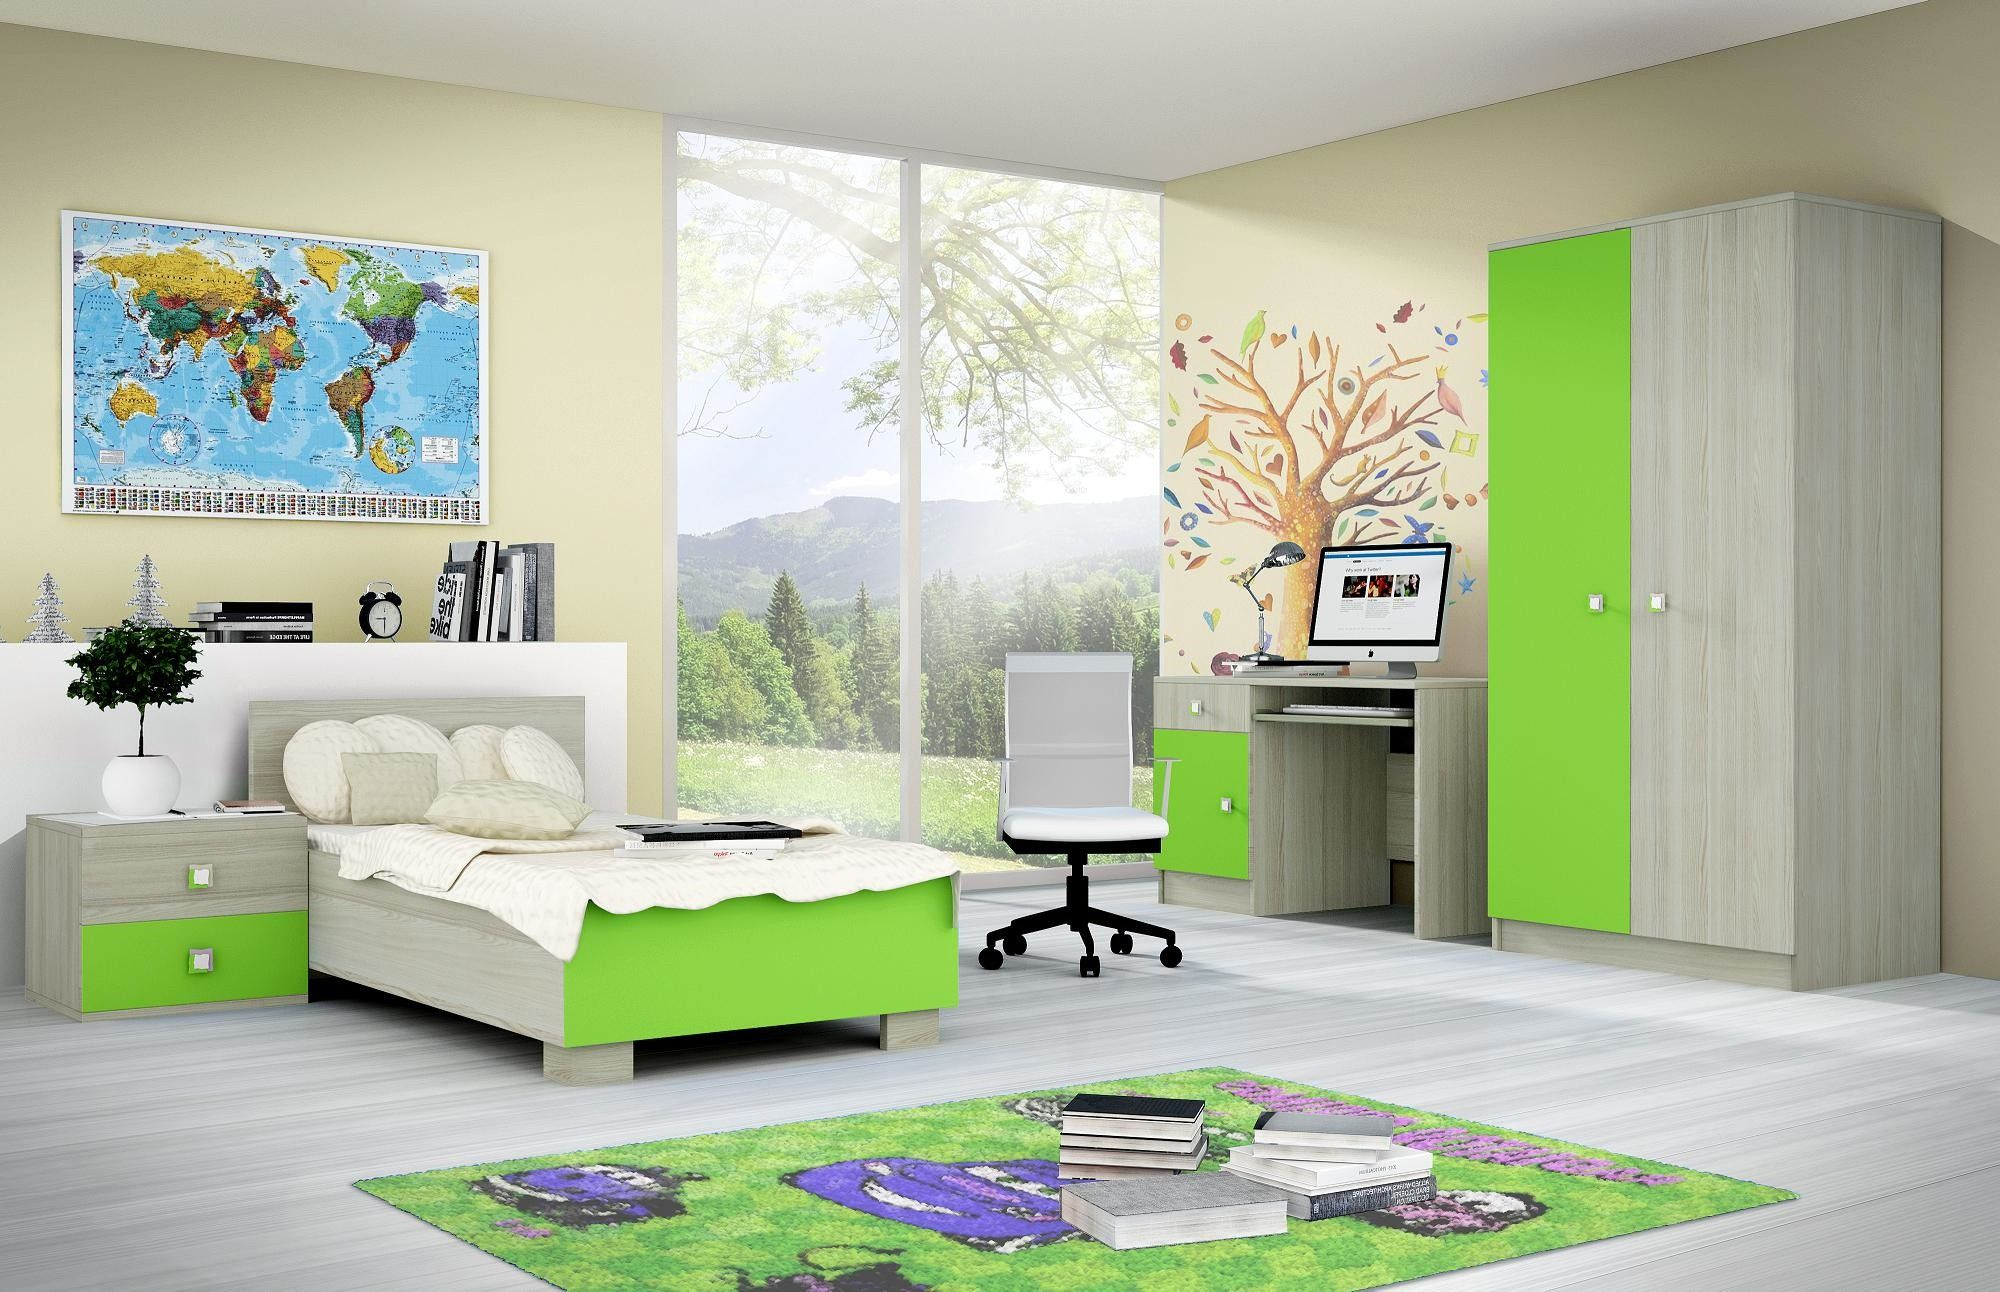 غرف نوم أطفال للمساحات الصغيرة Home Decor Furniture Home